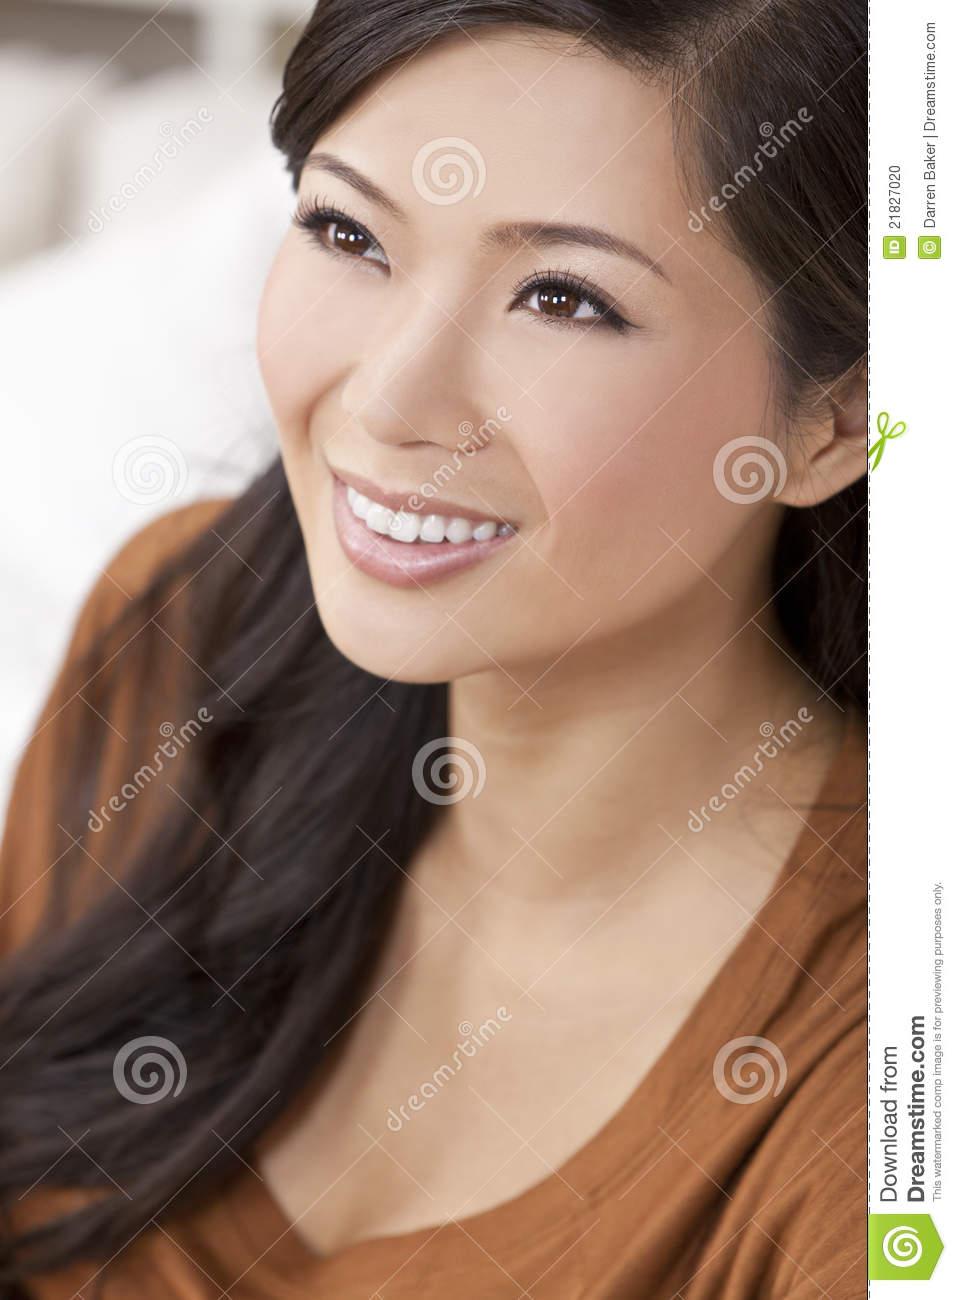 Quest reccomend Asian oriental women